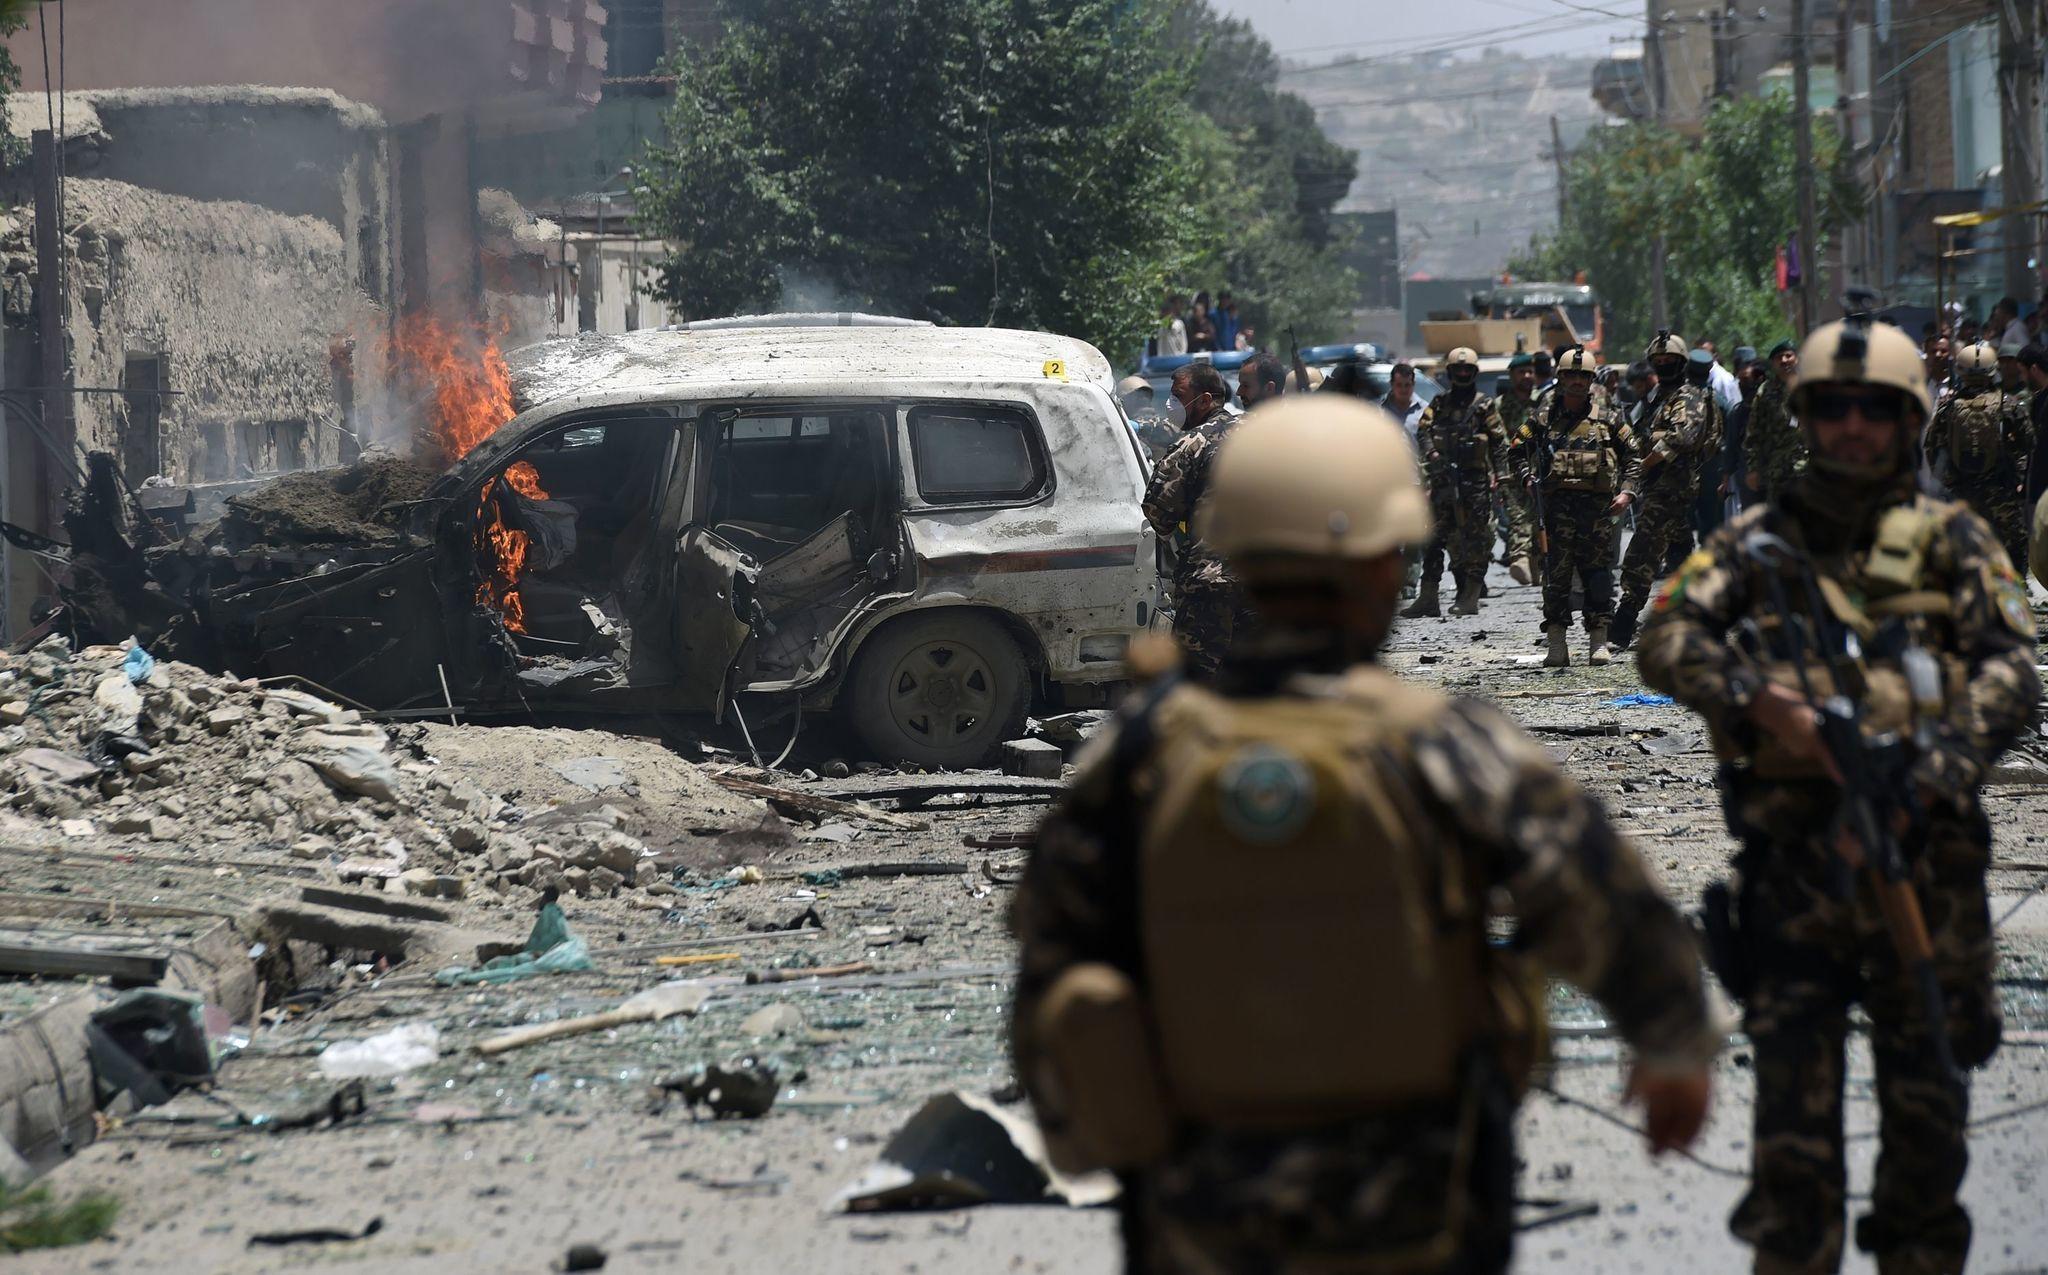 U.S. faces international probe over Afghanistan - Sun Sentinel